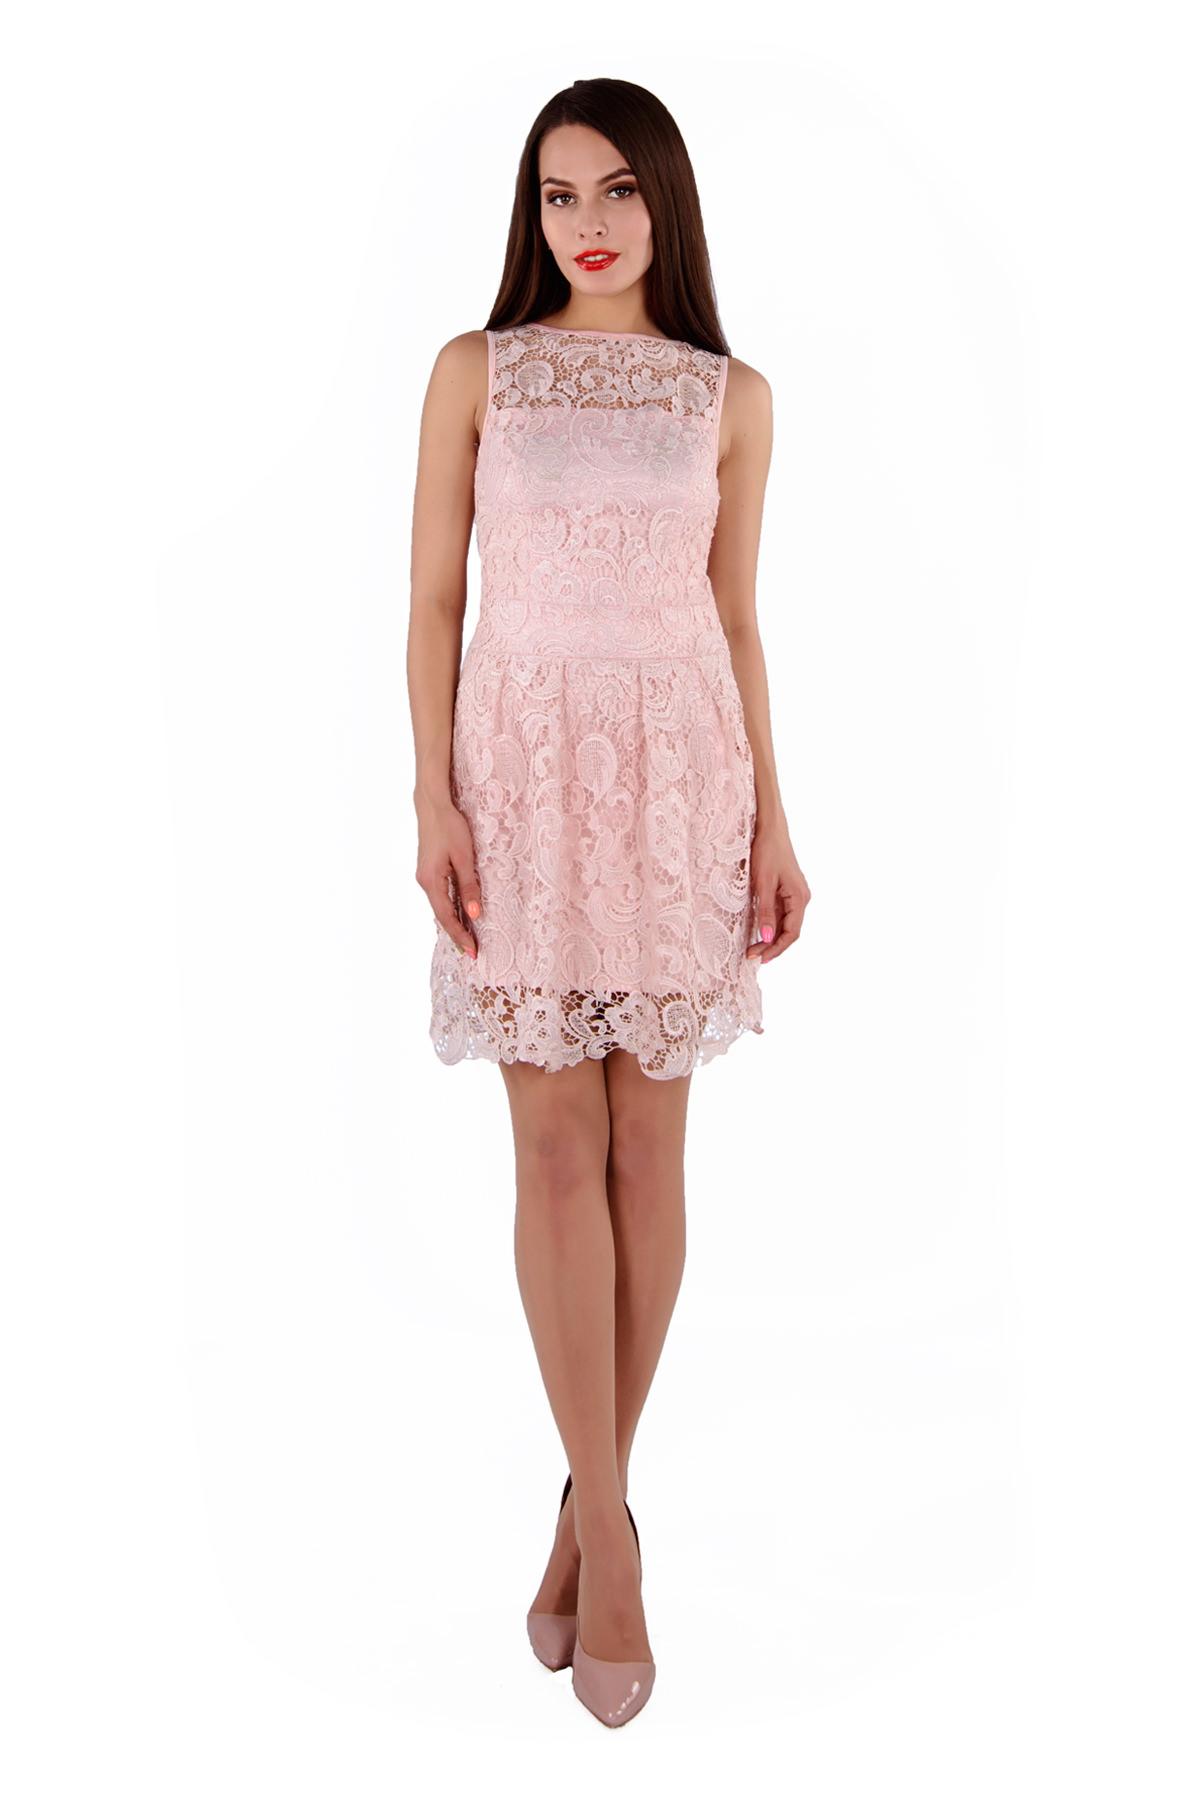 Женские платья оптом от Modus Платье Жанетта